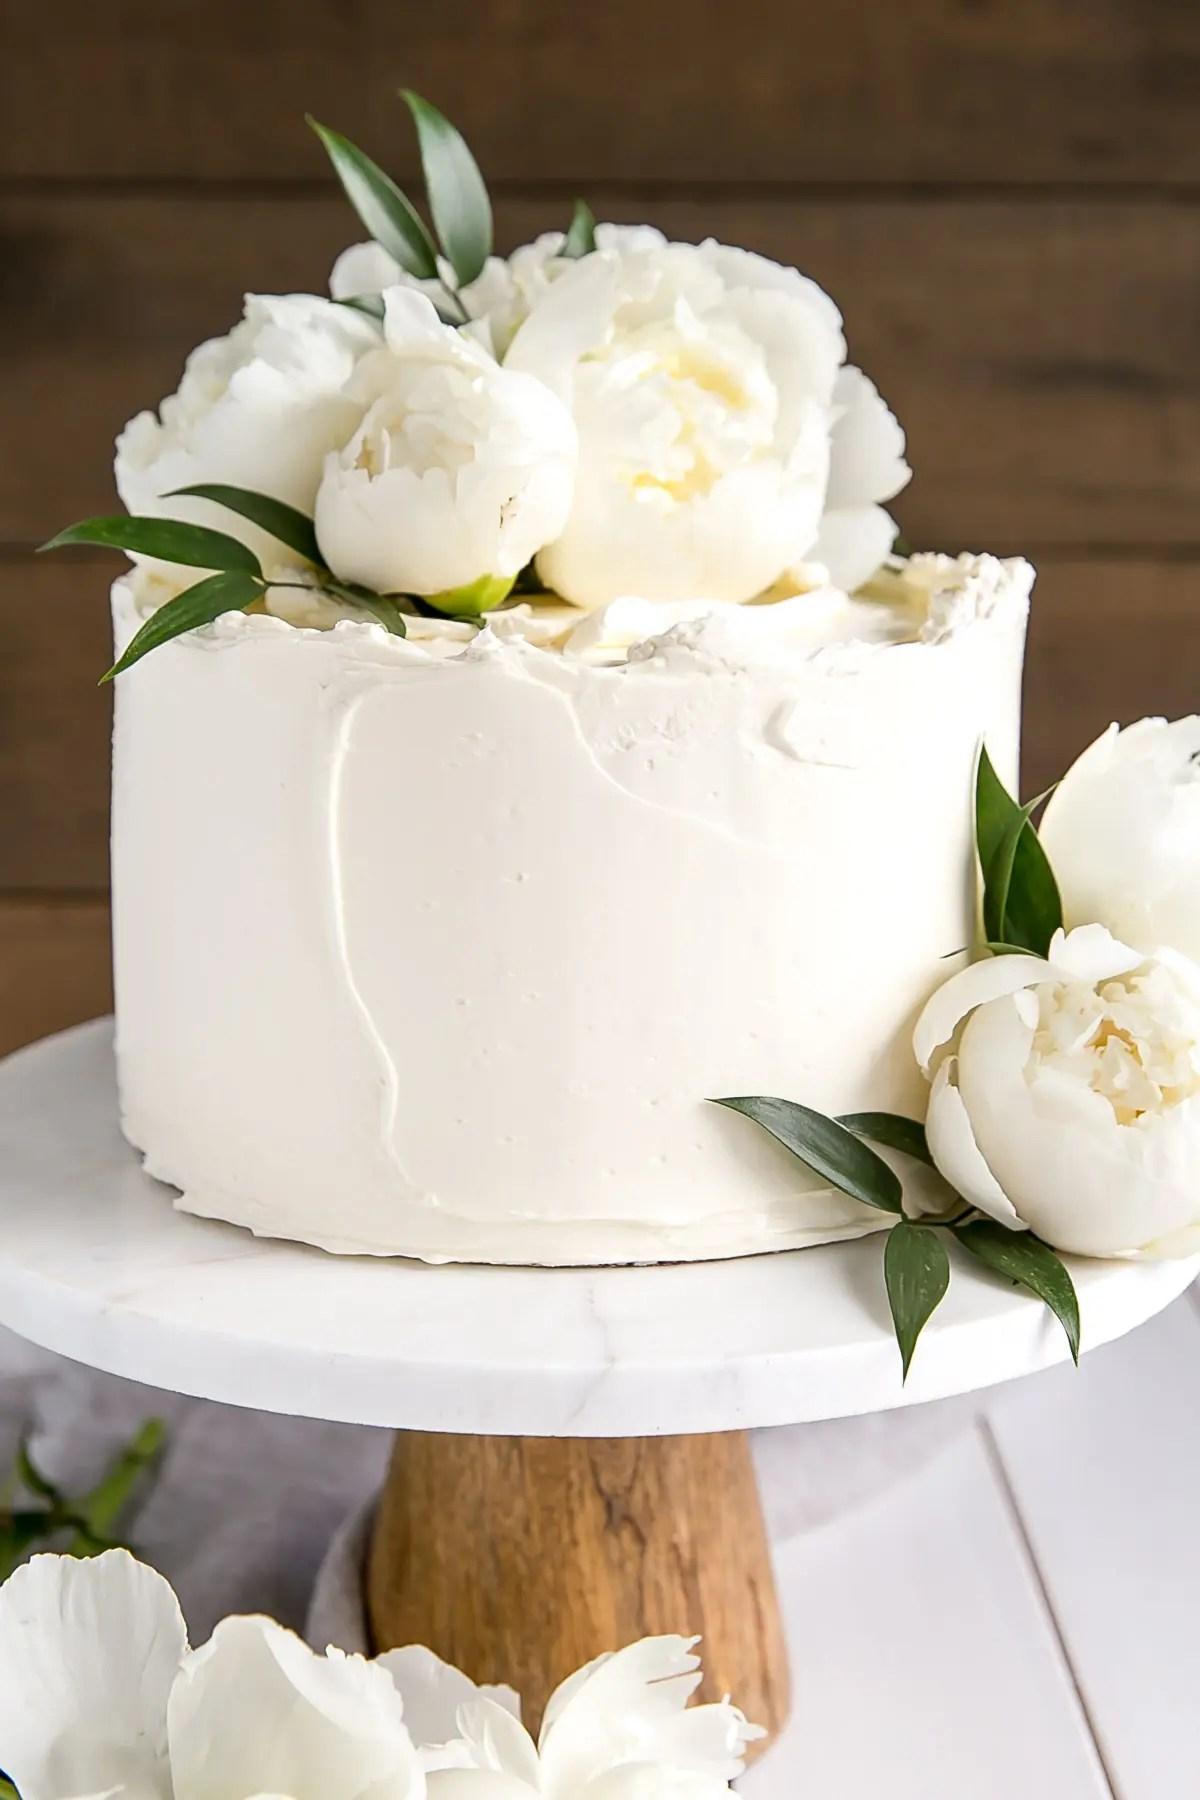 Lemon Elderflower Cake Copycat Royal Wedding Cake